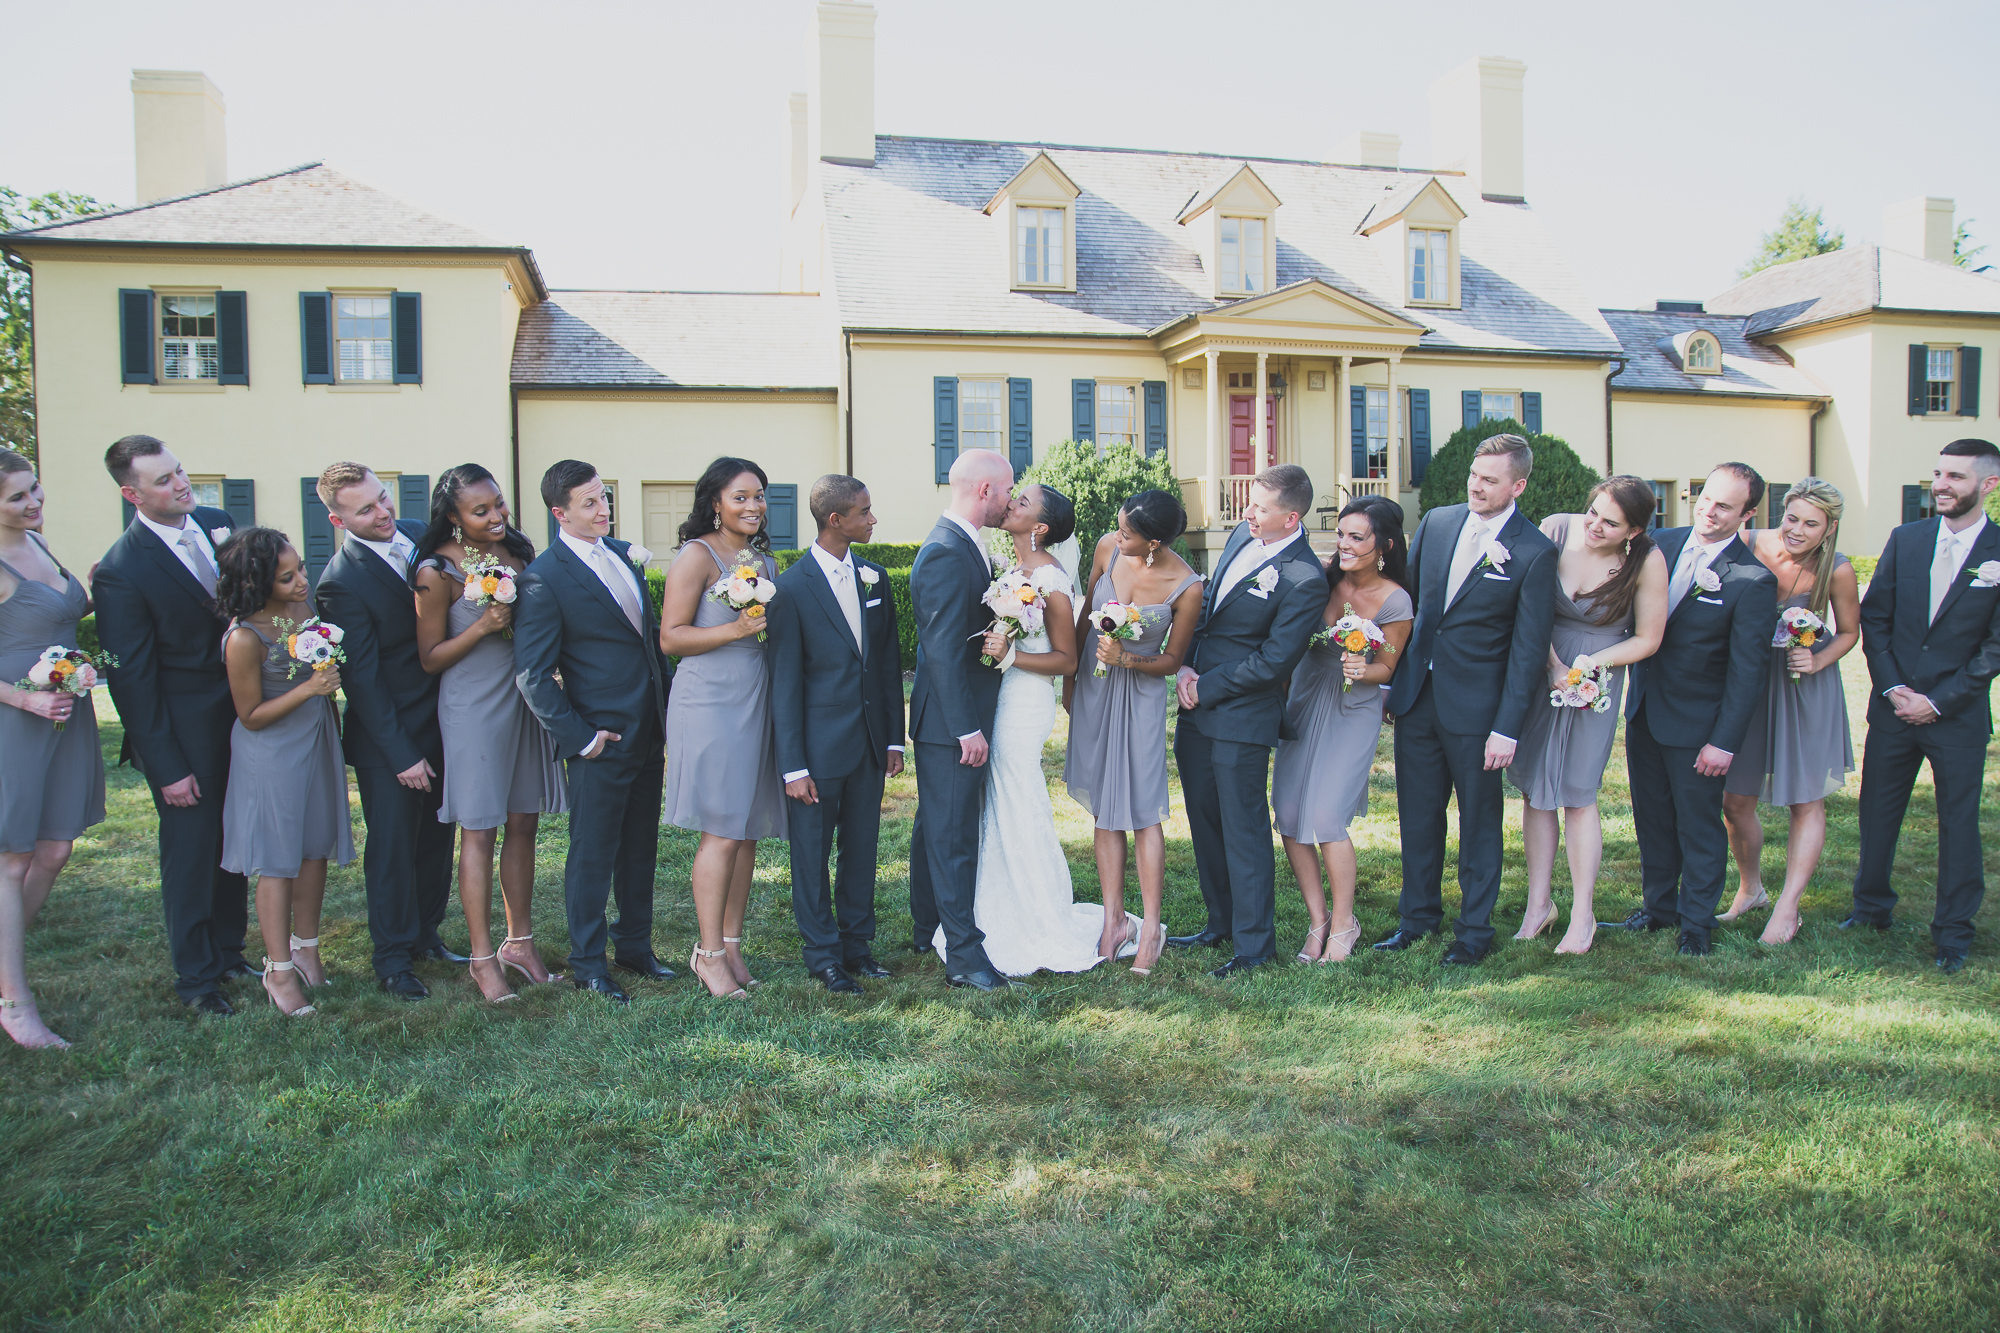 Belmont Manor & Historic Park Wedding Party Photo